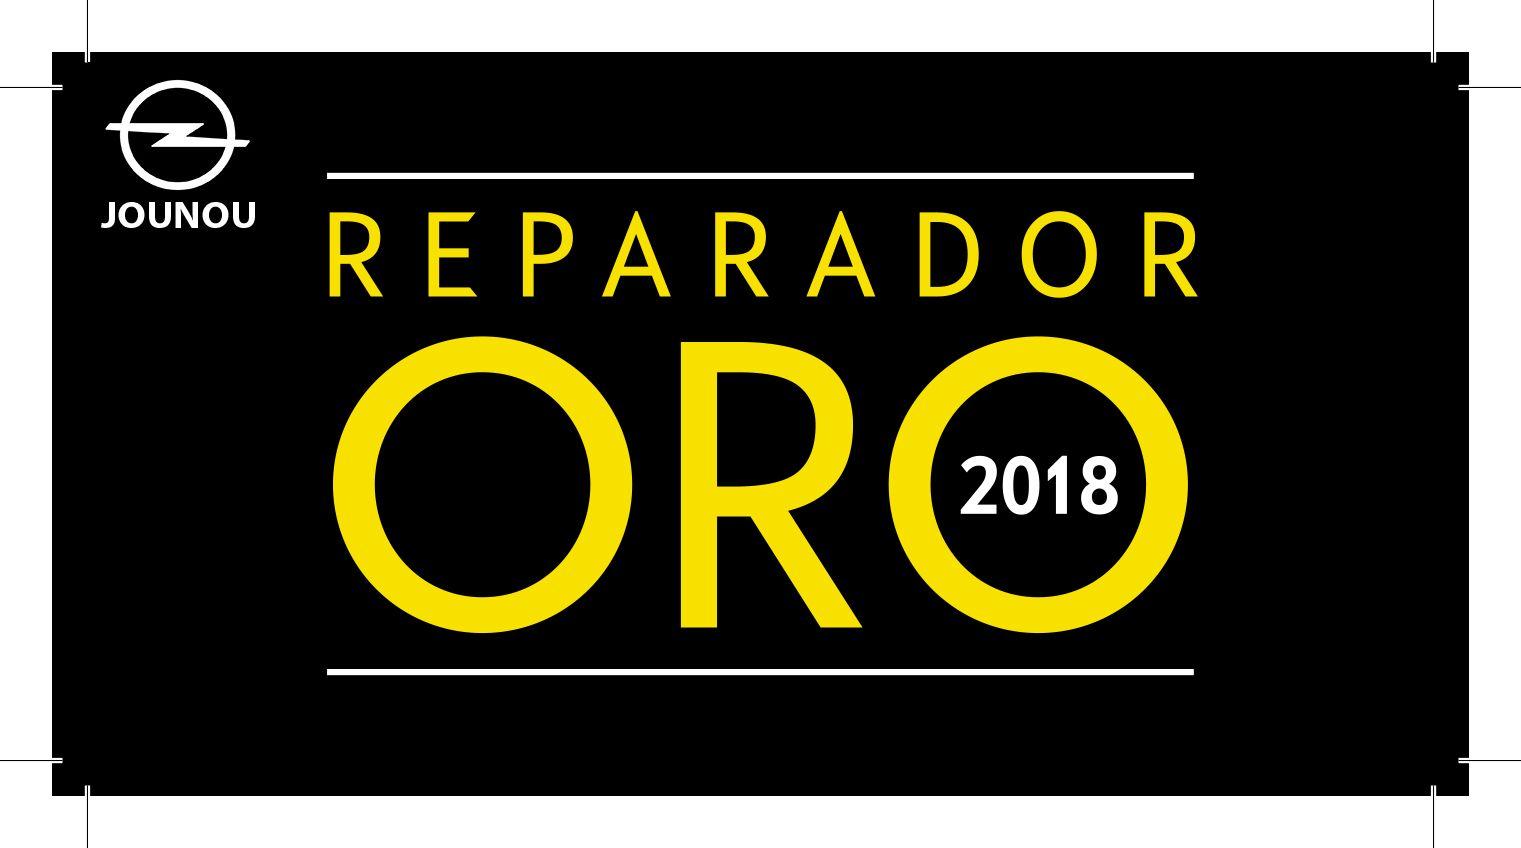 REPARADOR ORO 2018